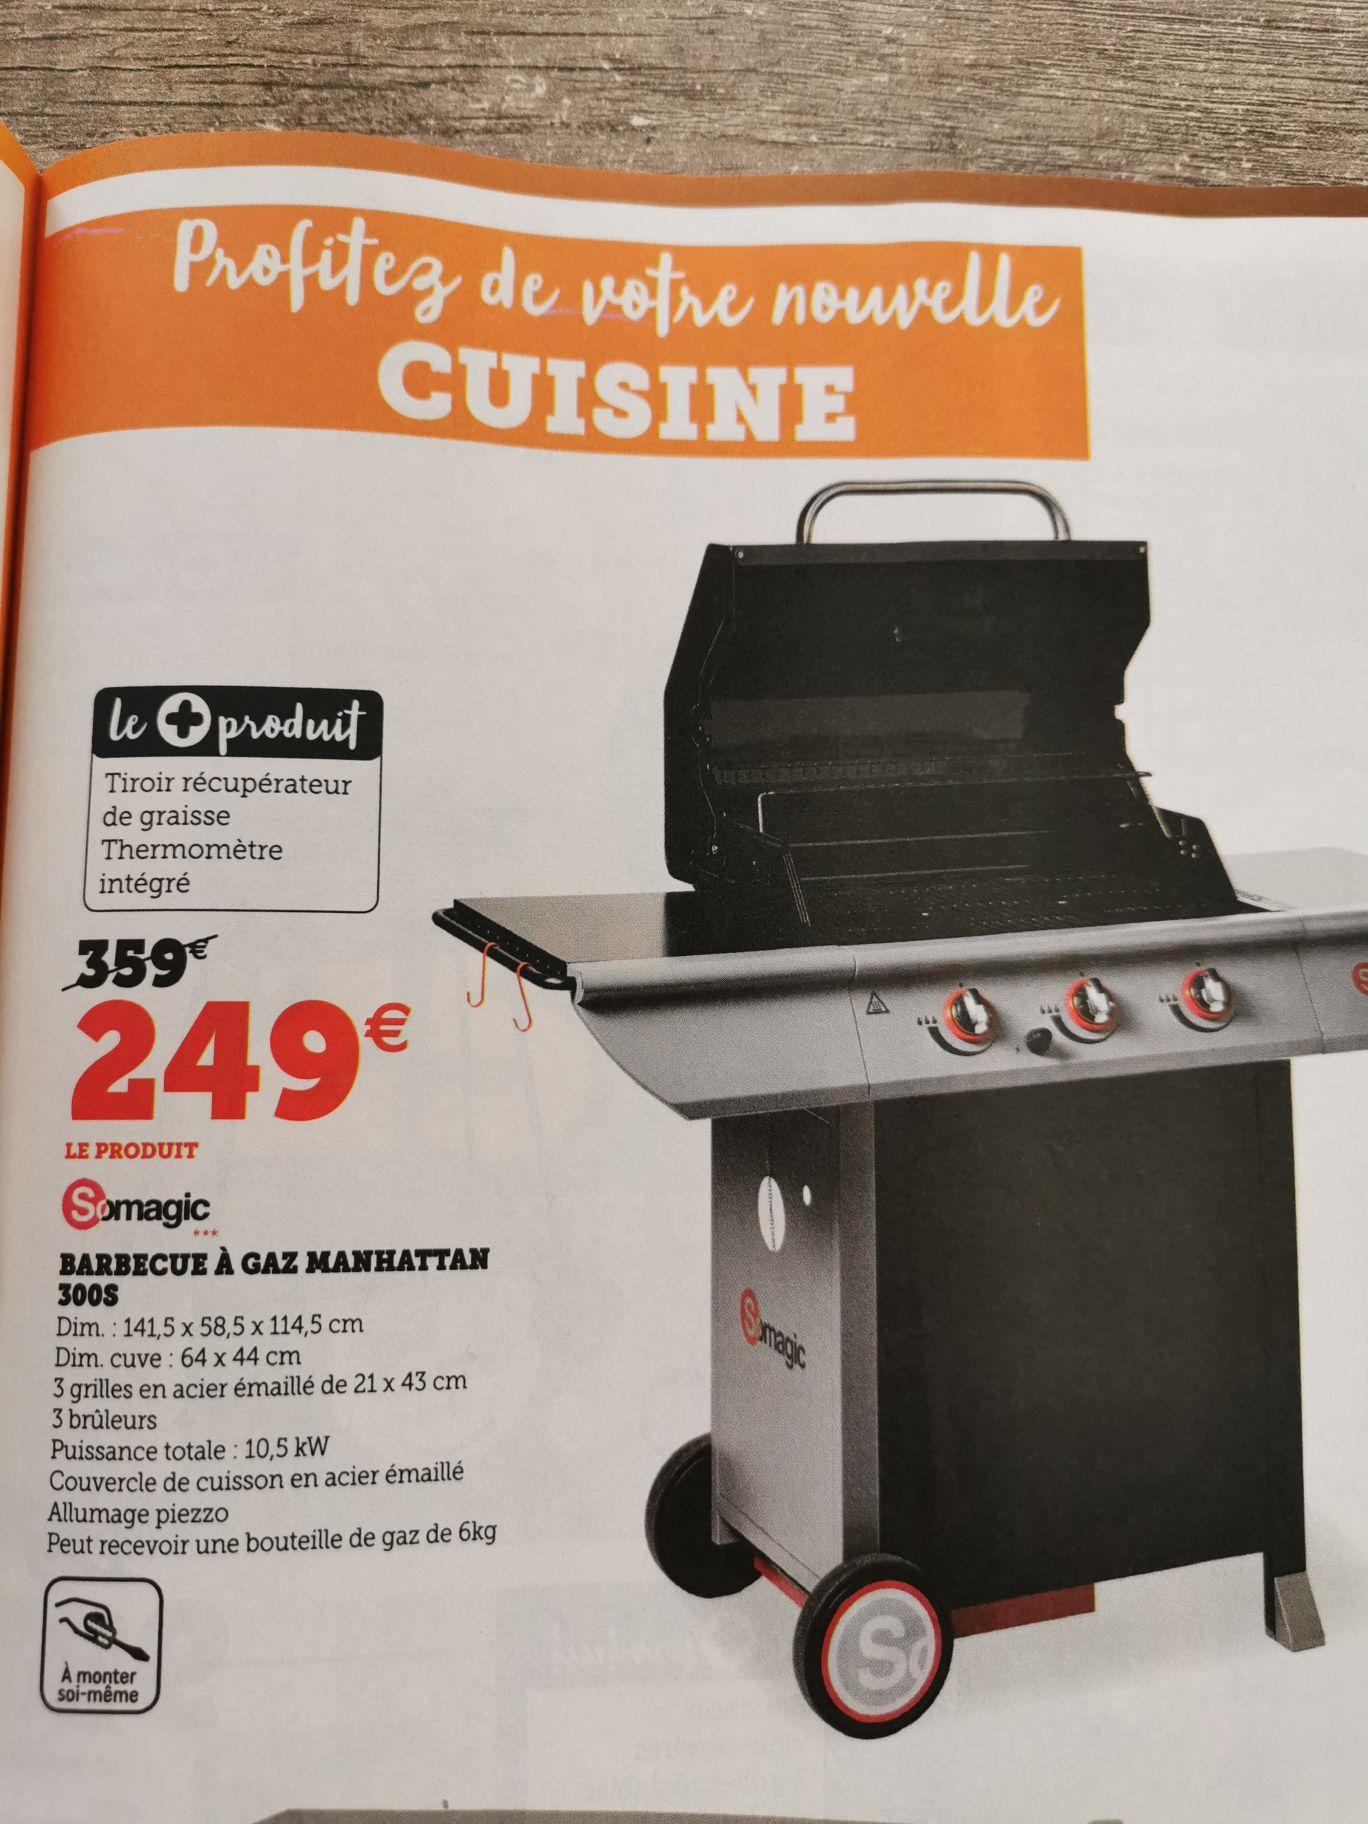 Barbecue à SoMagic gaz Manhattan 300S - 3 brûleurs, 10.5 kW